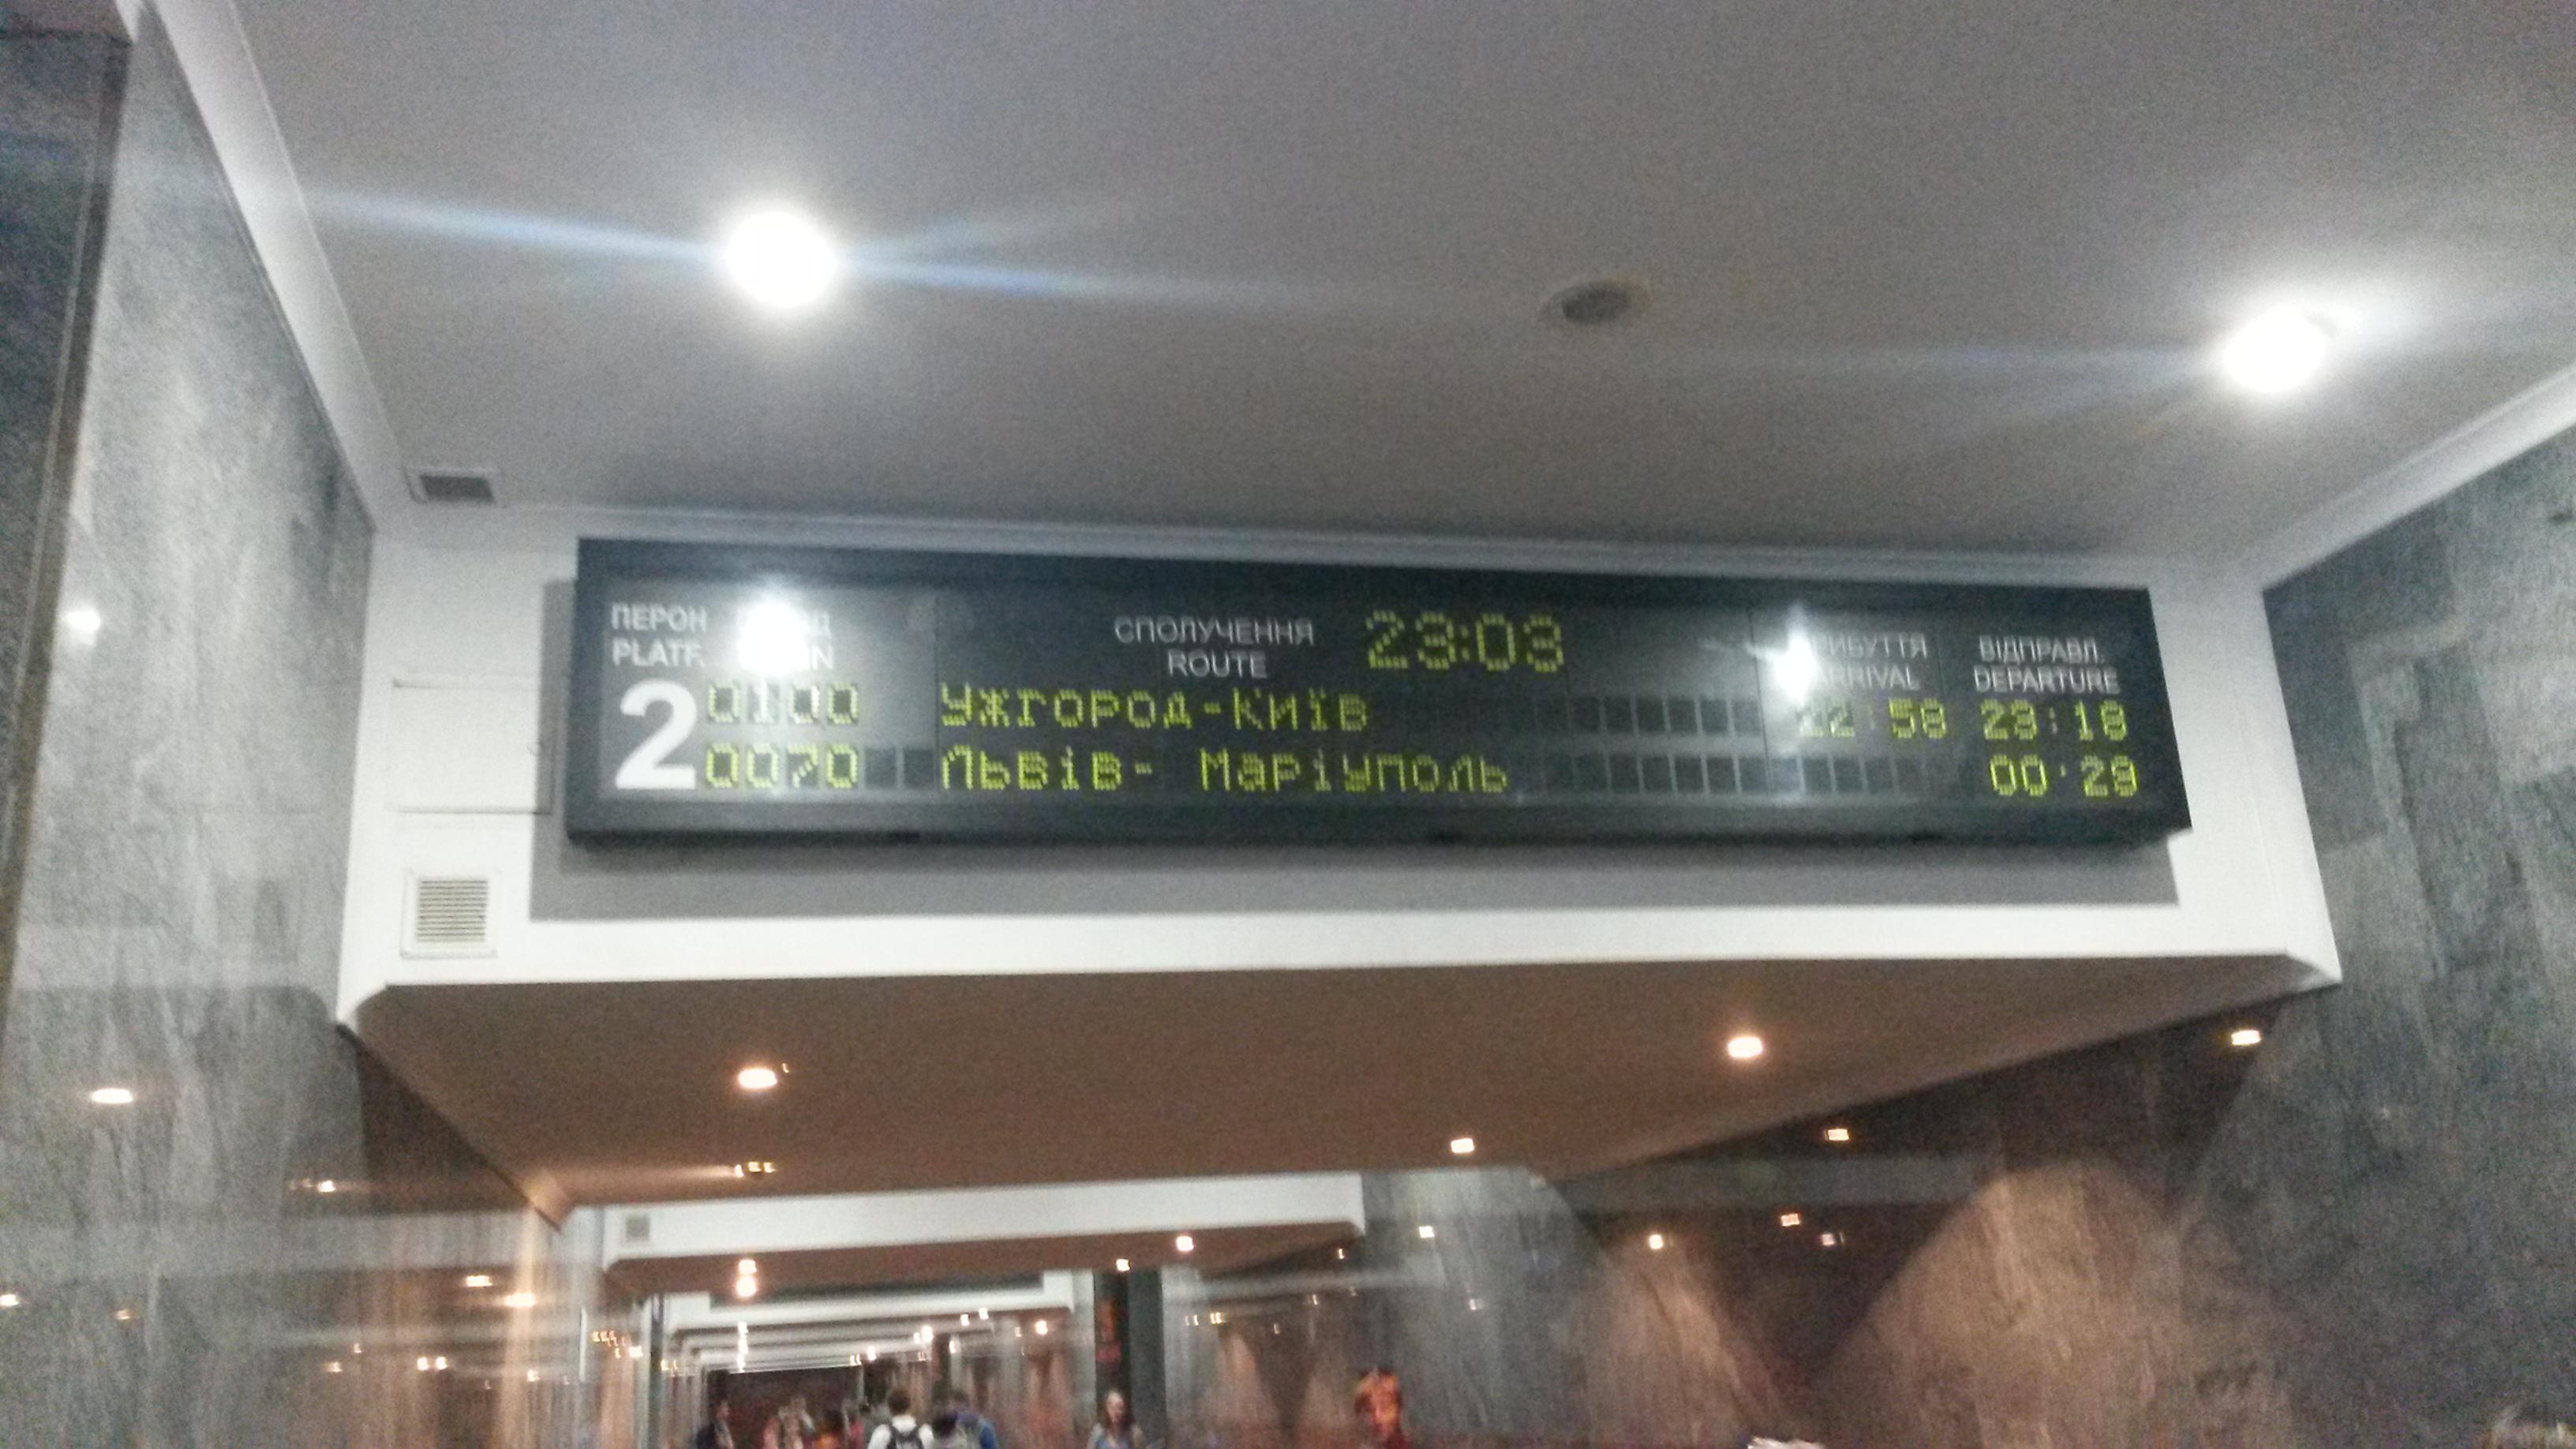 Uzhorod-Kyiv Treni